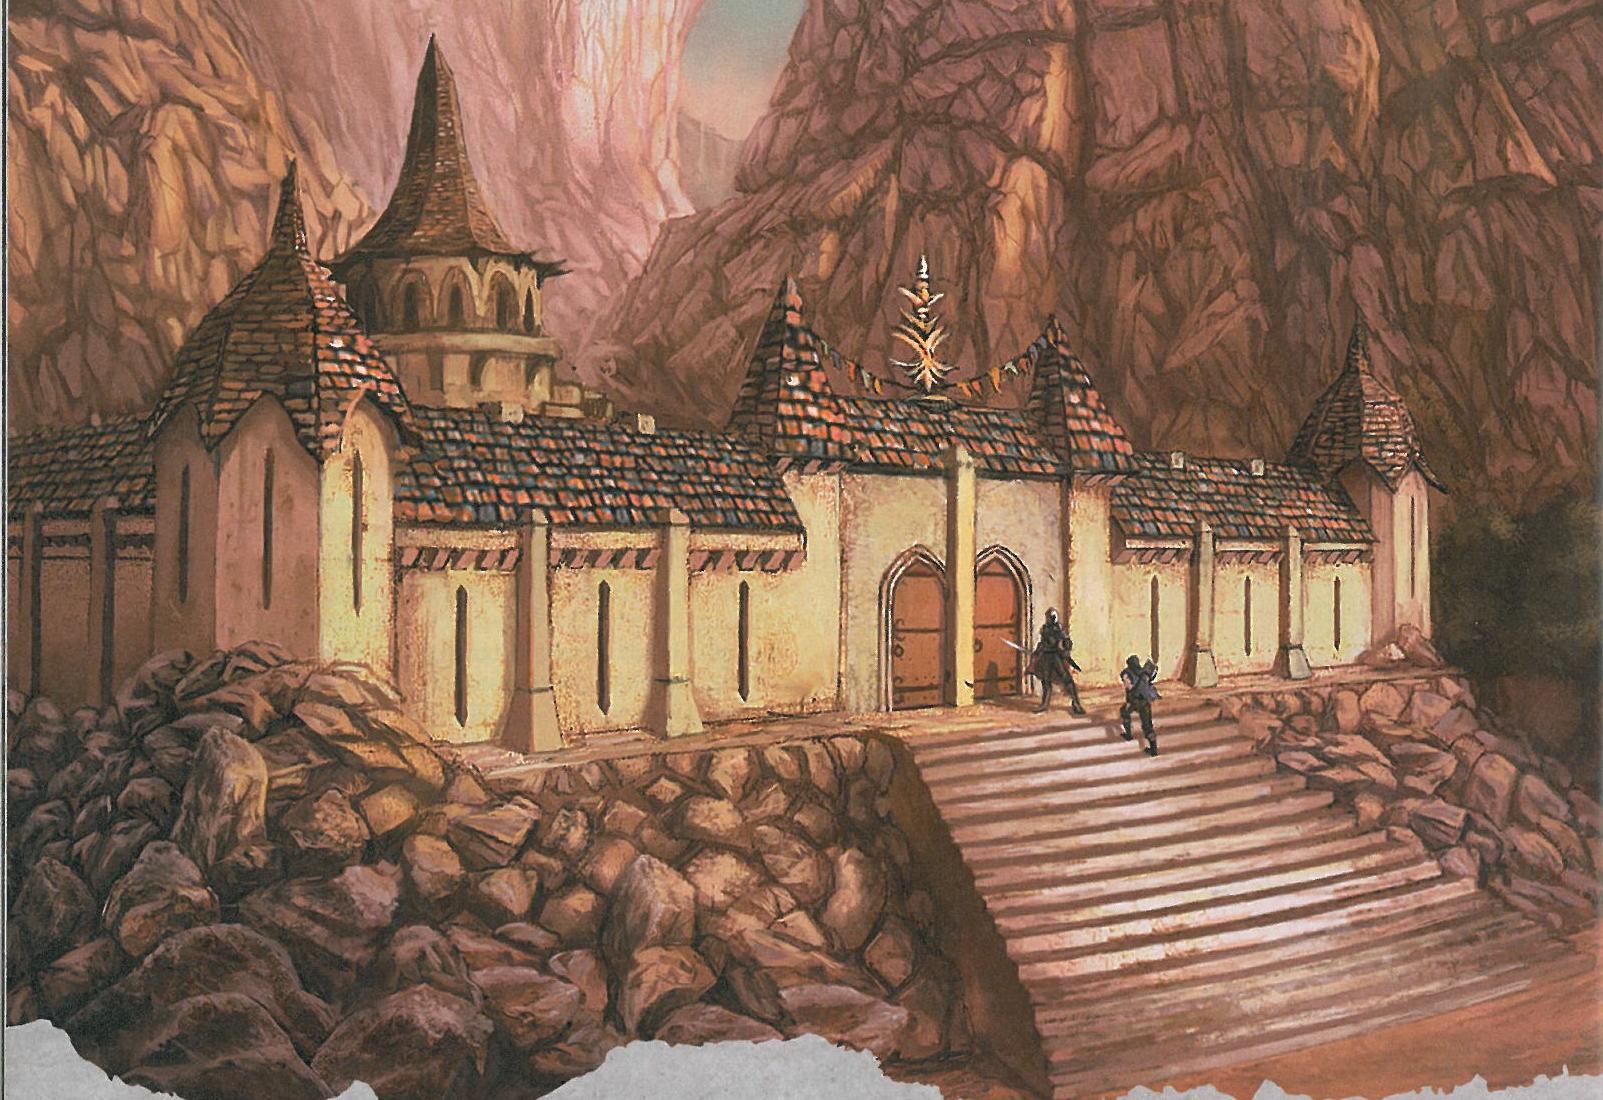 Sacred Stone Monastery | Princes of the Apocalypse (TN 5e